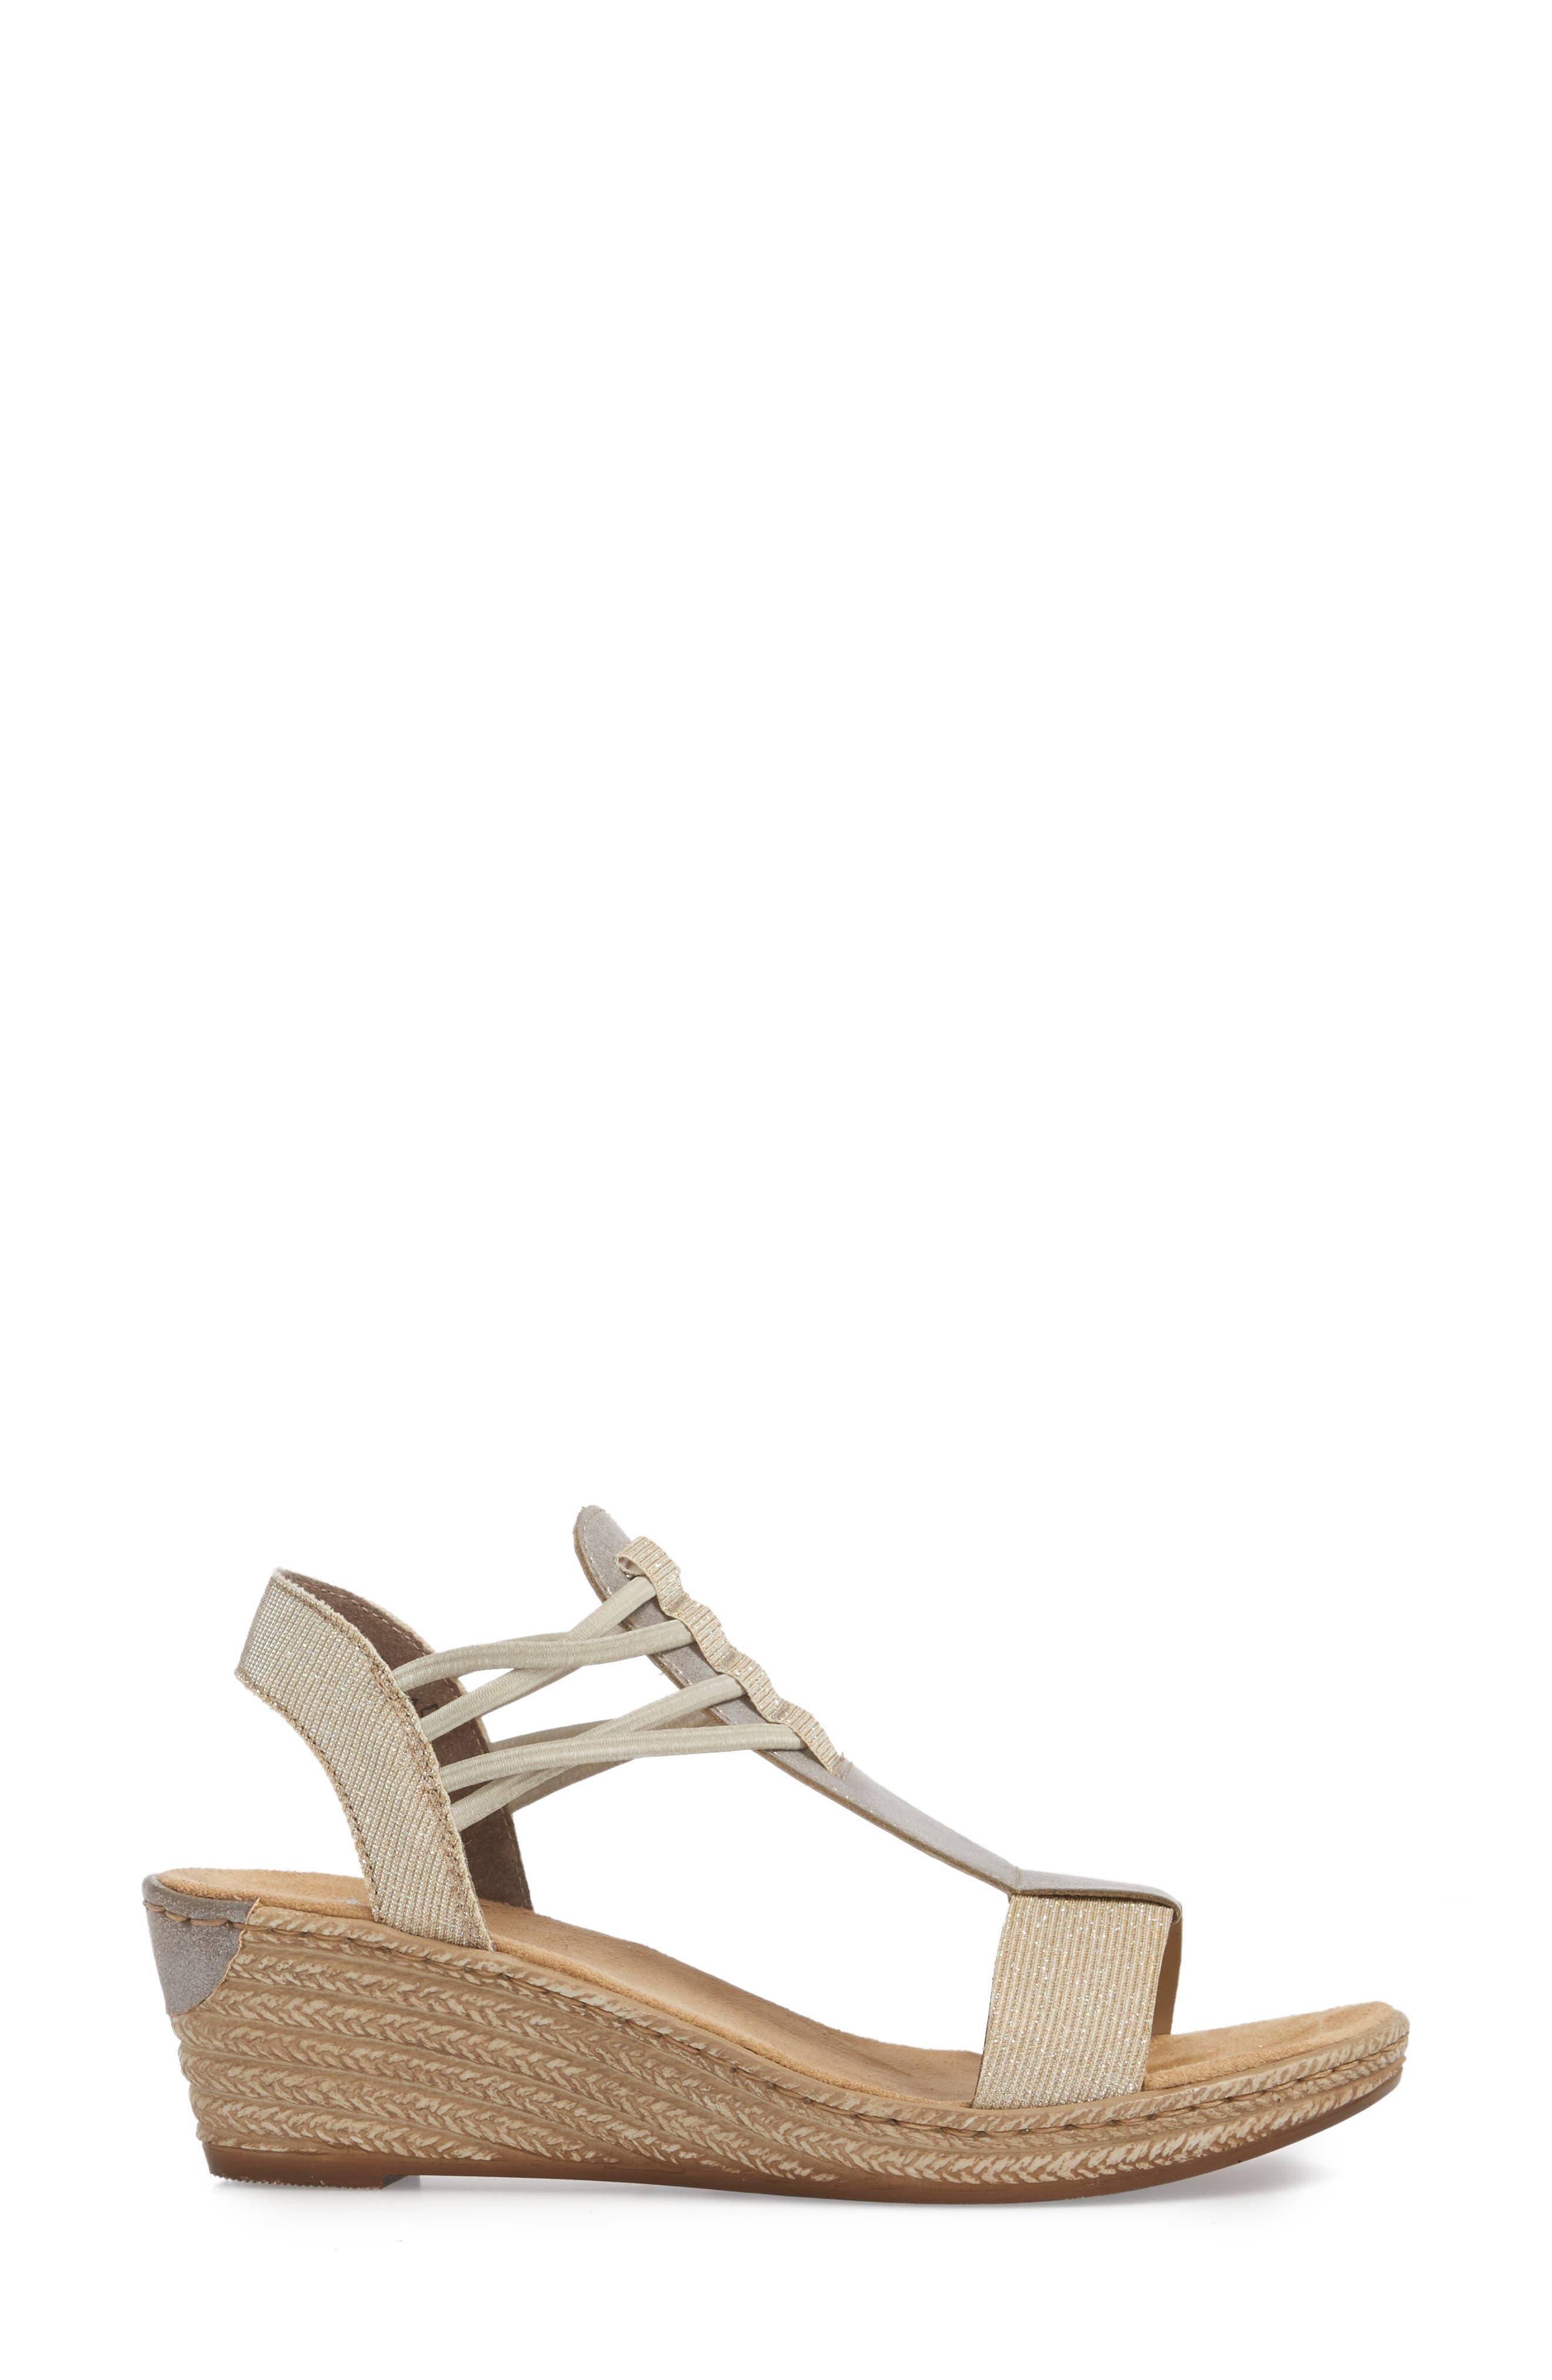 Fanni 22 Espadrille Wedge Sandal,                             Alternate thumbnail 3, color,                             Light Gold/ Grey Fabric